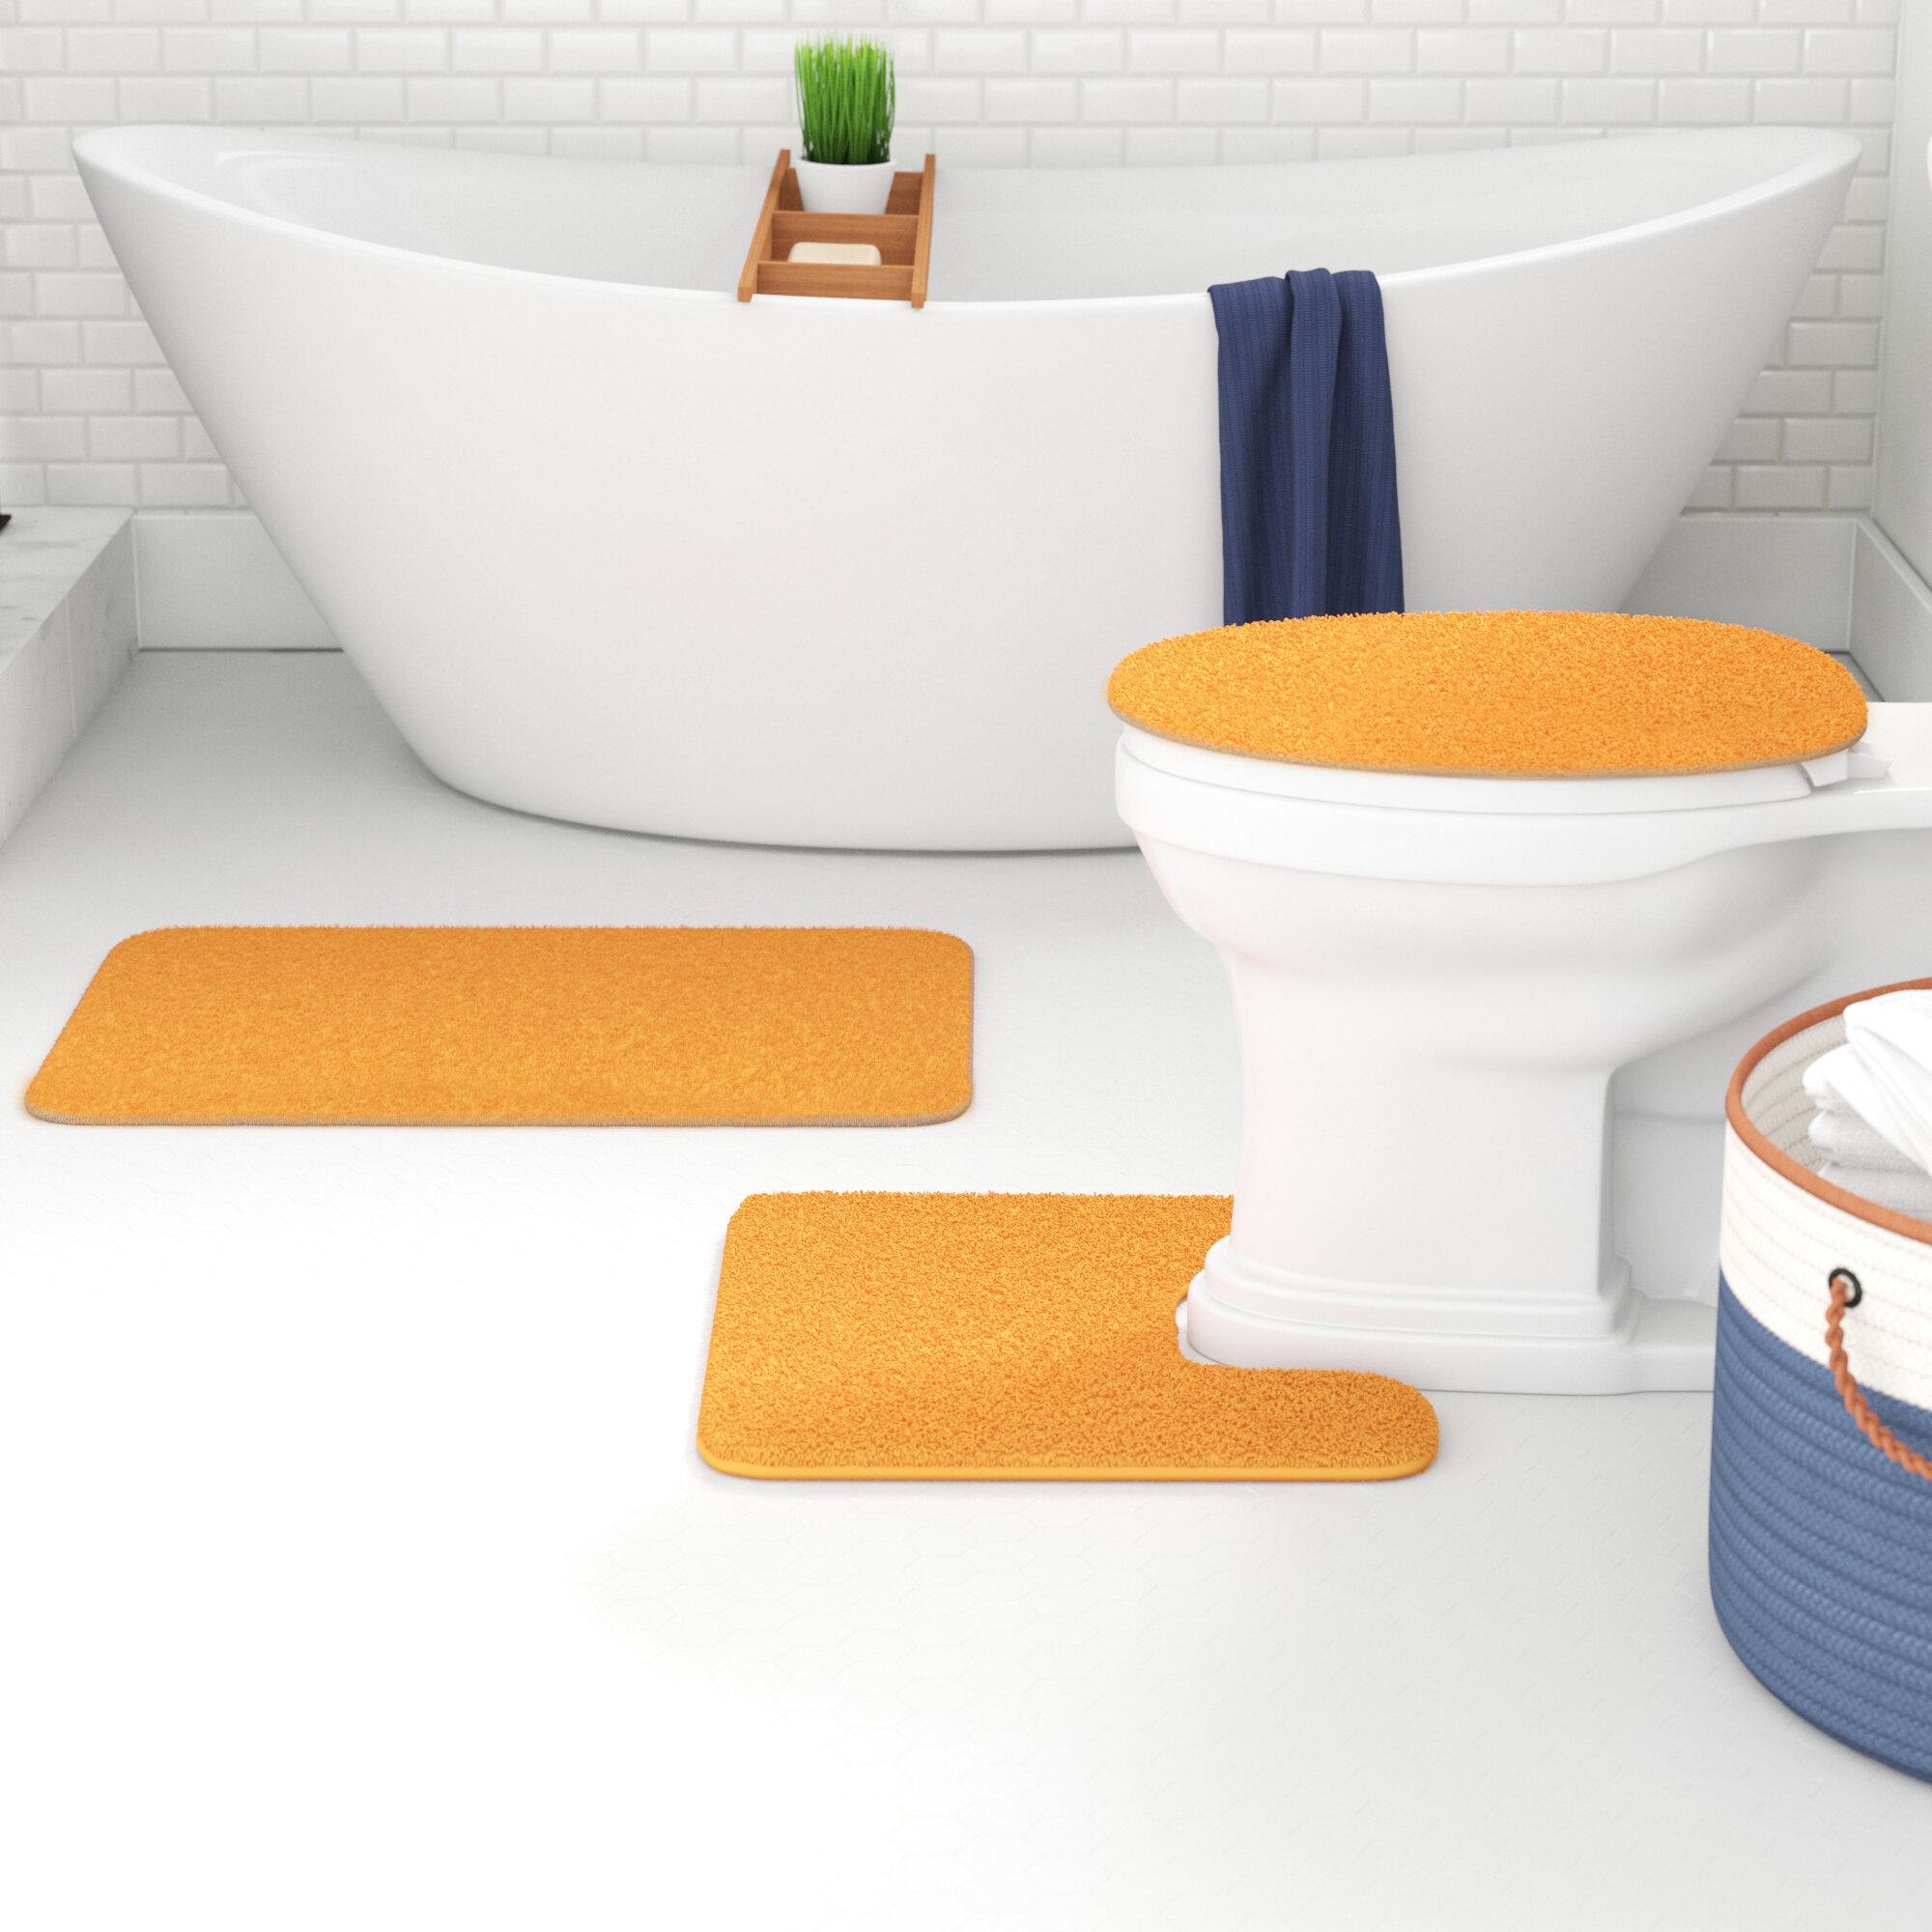 Orange Bath Rugs Mats Free Shipping Over 35 Wayfair